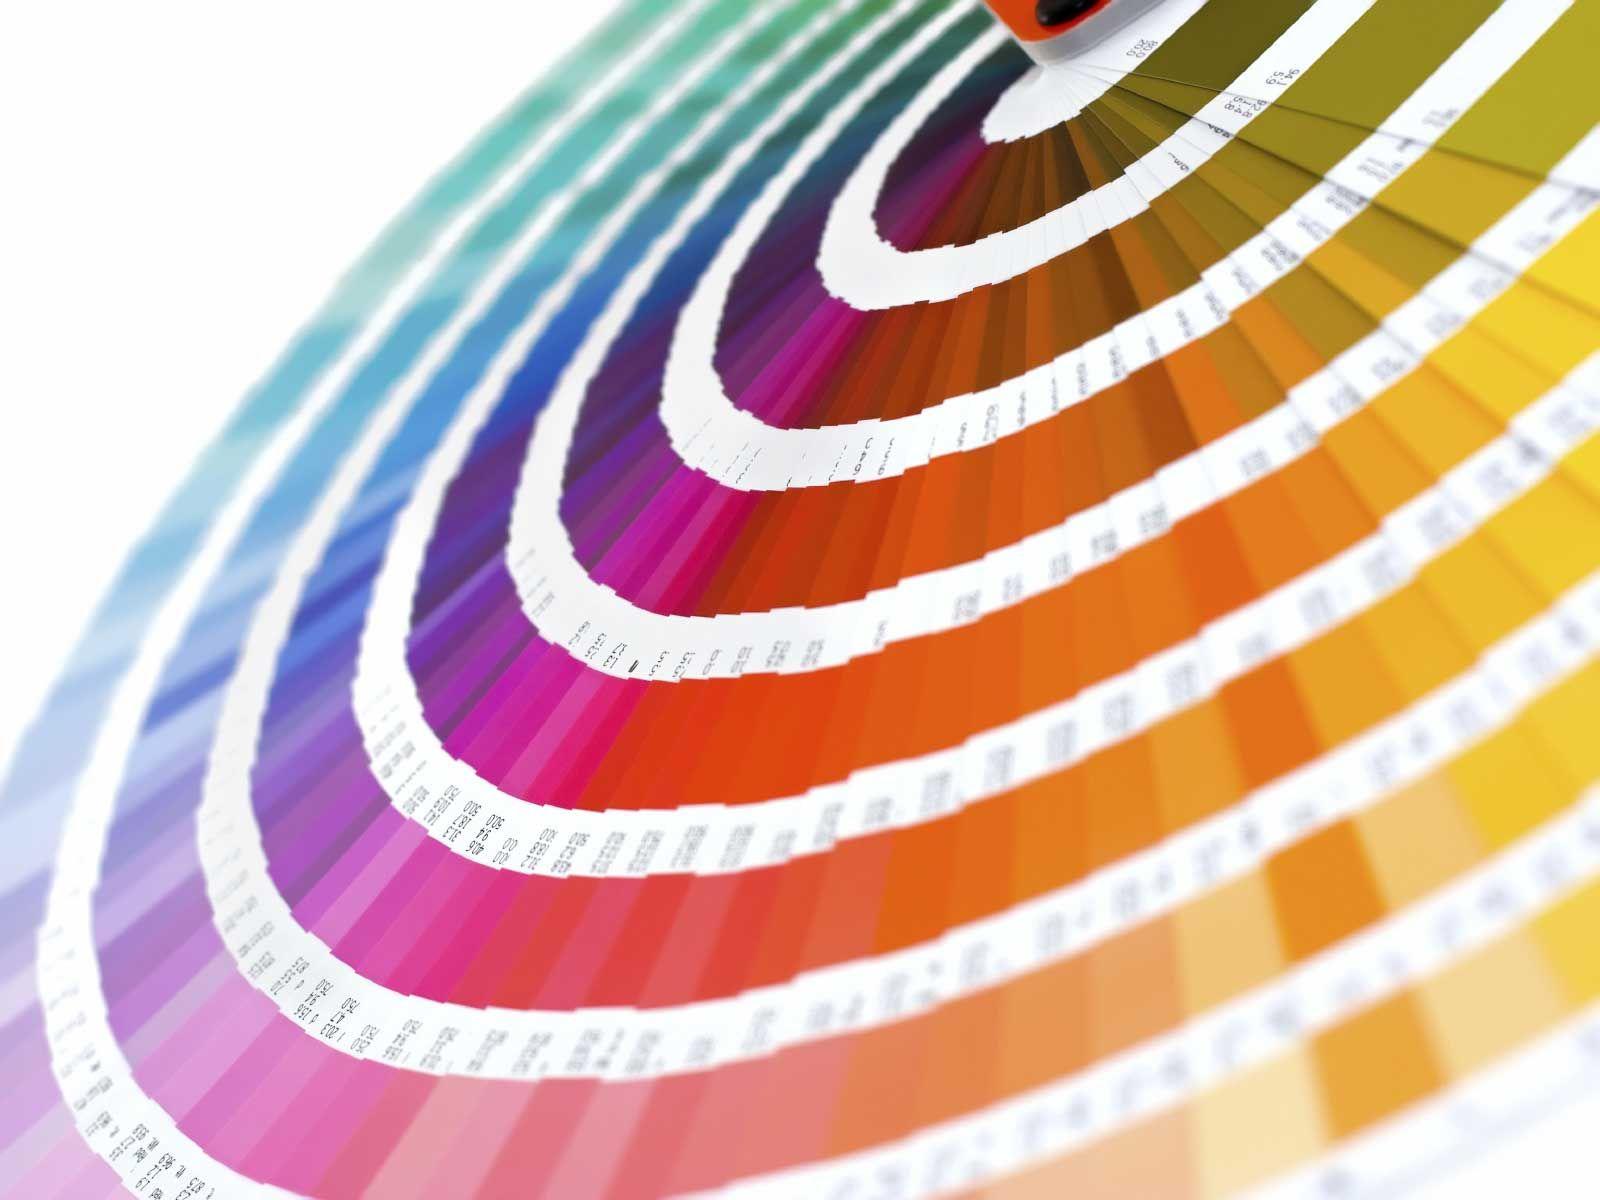 pantone color chart - Pantone Color Book